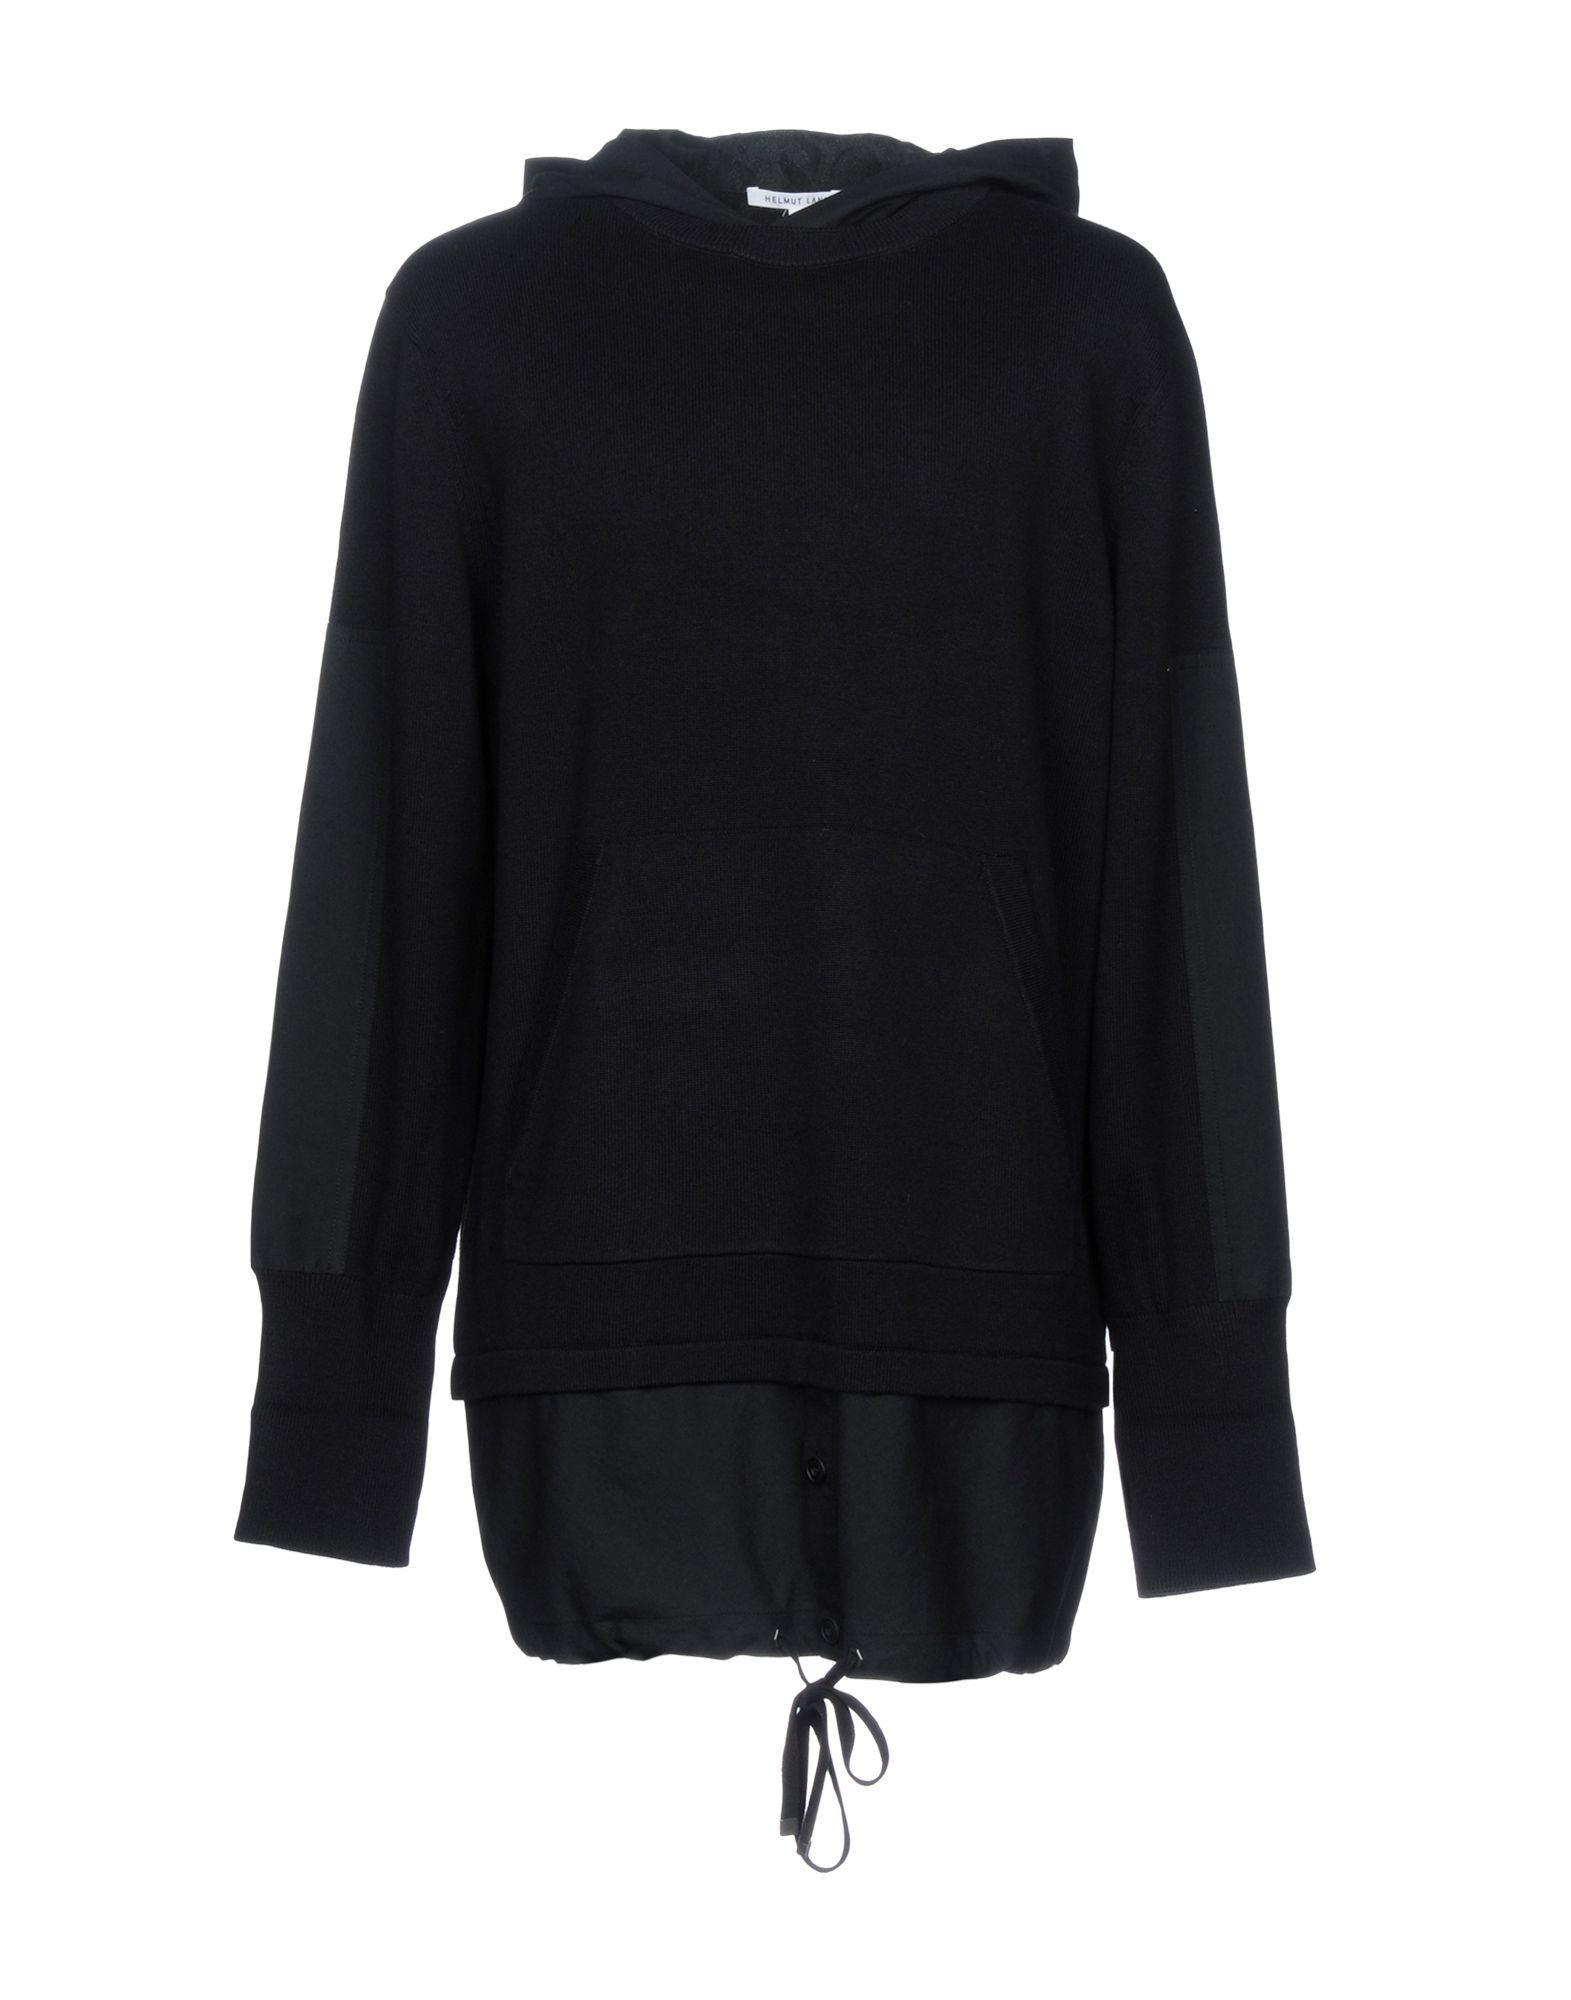 Helmut Lang Sweater In Black